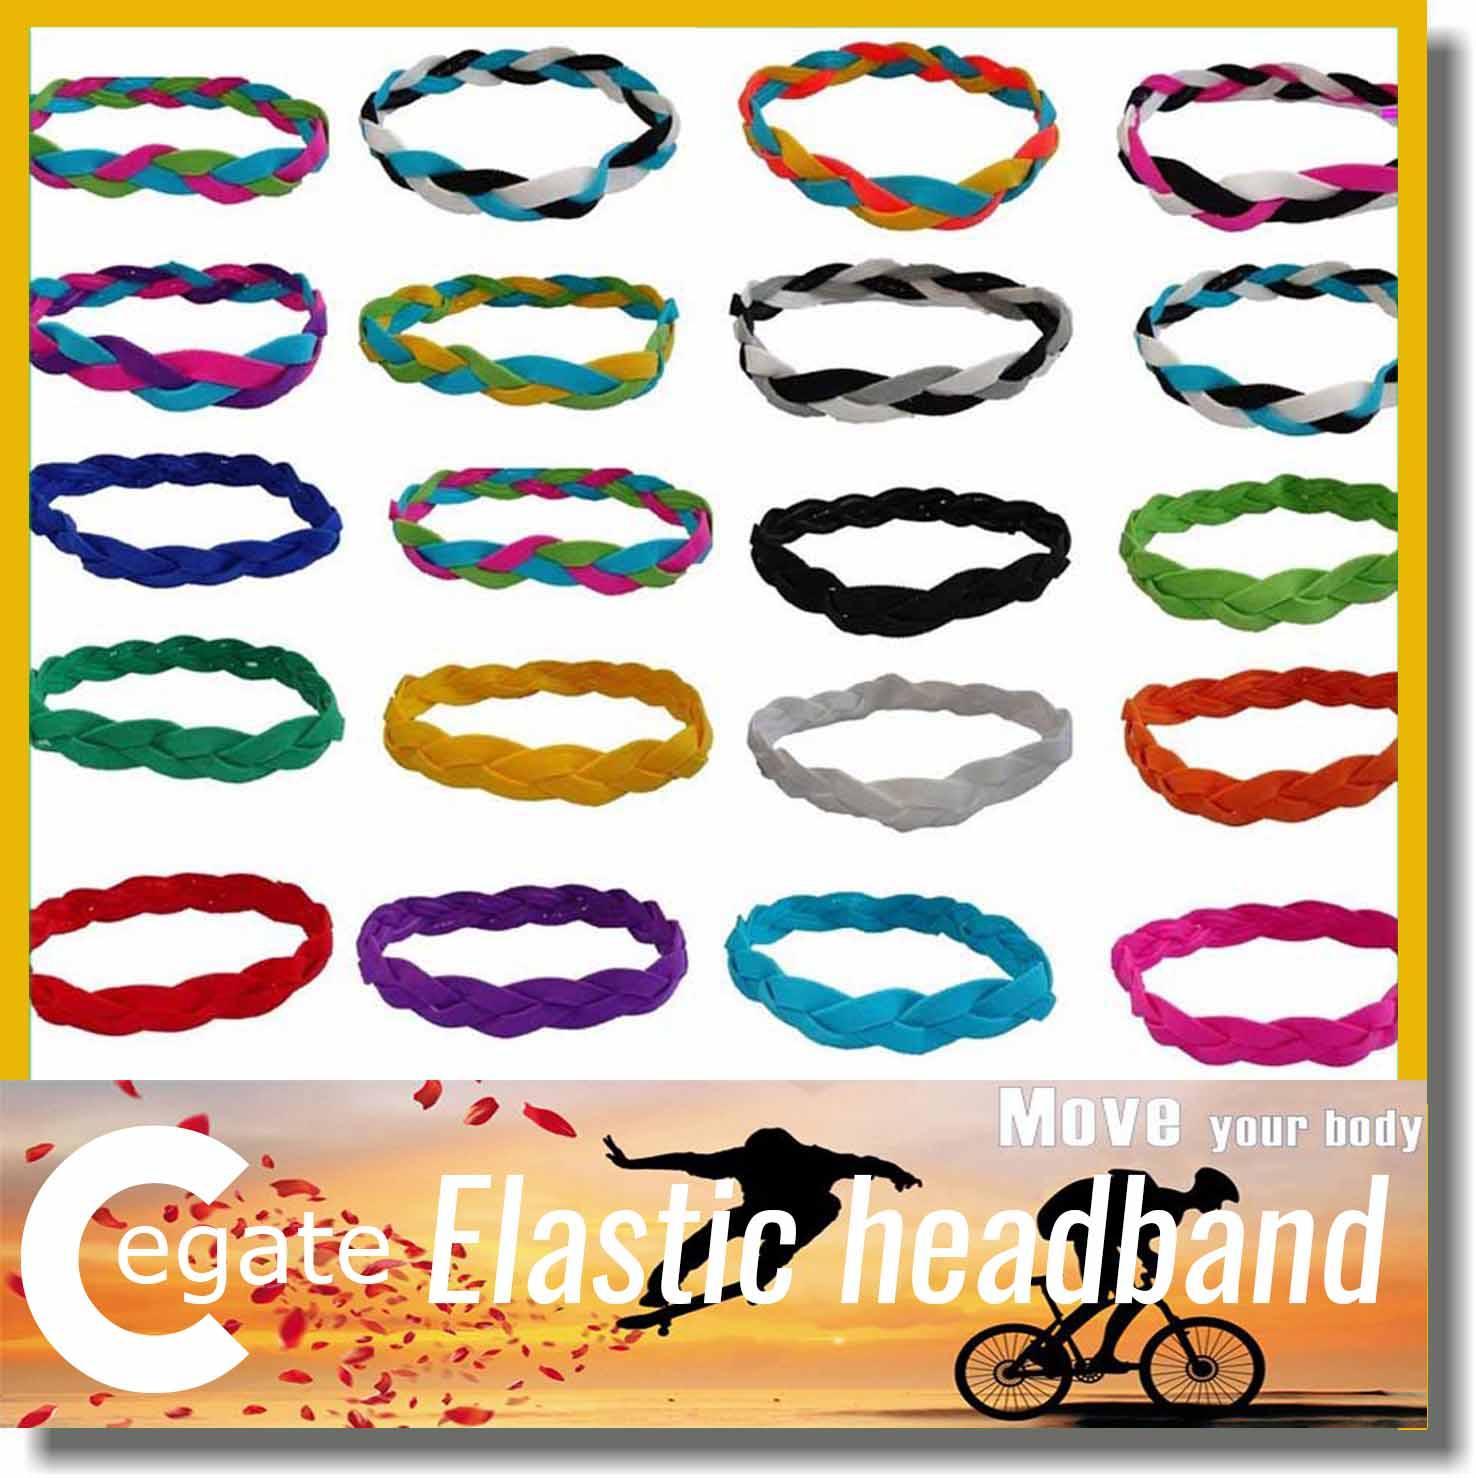 Hot sale Slip Fashion Braided Yoga Headband Sports Elastic Braided Headband for women girl free shipping